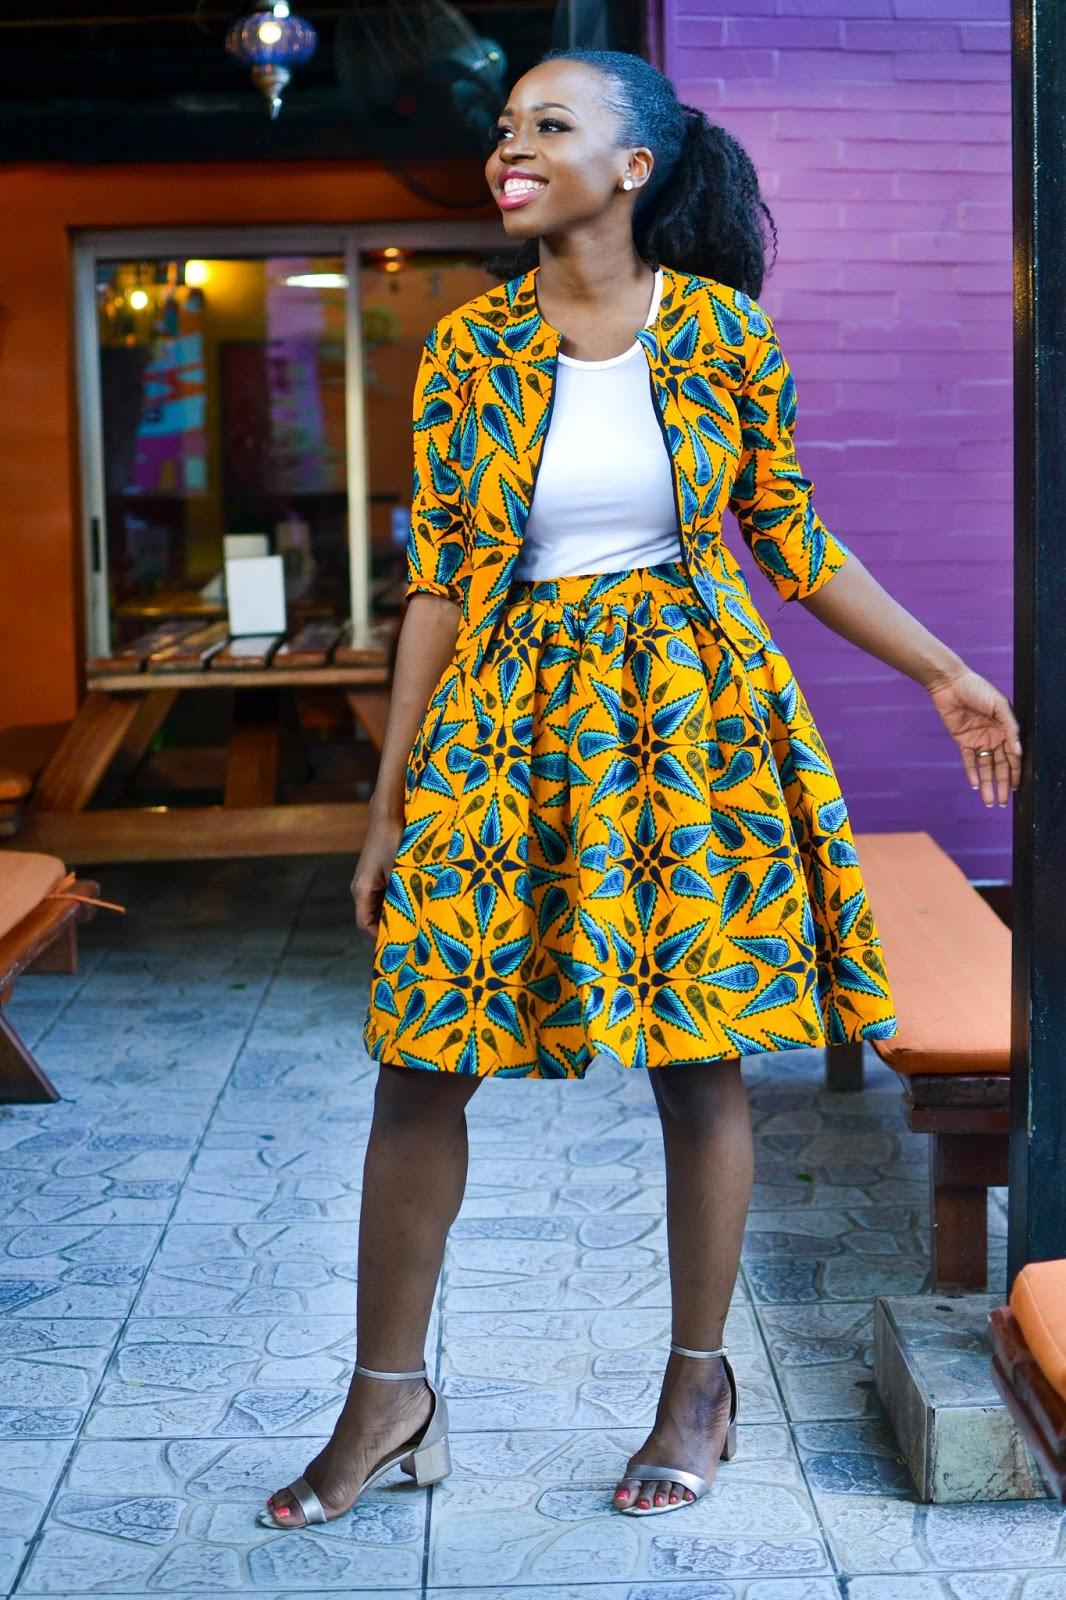 Ankara Skirt Suit on a Classy Black Blogger